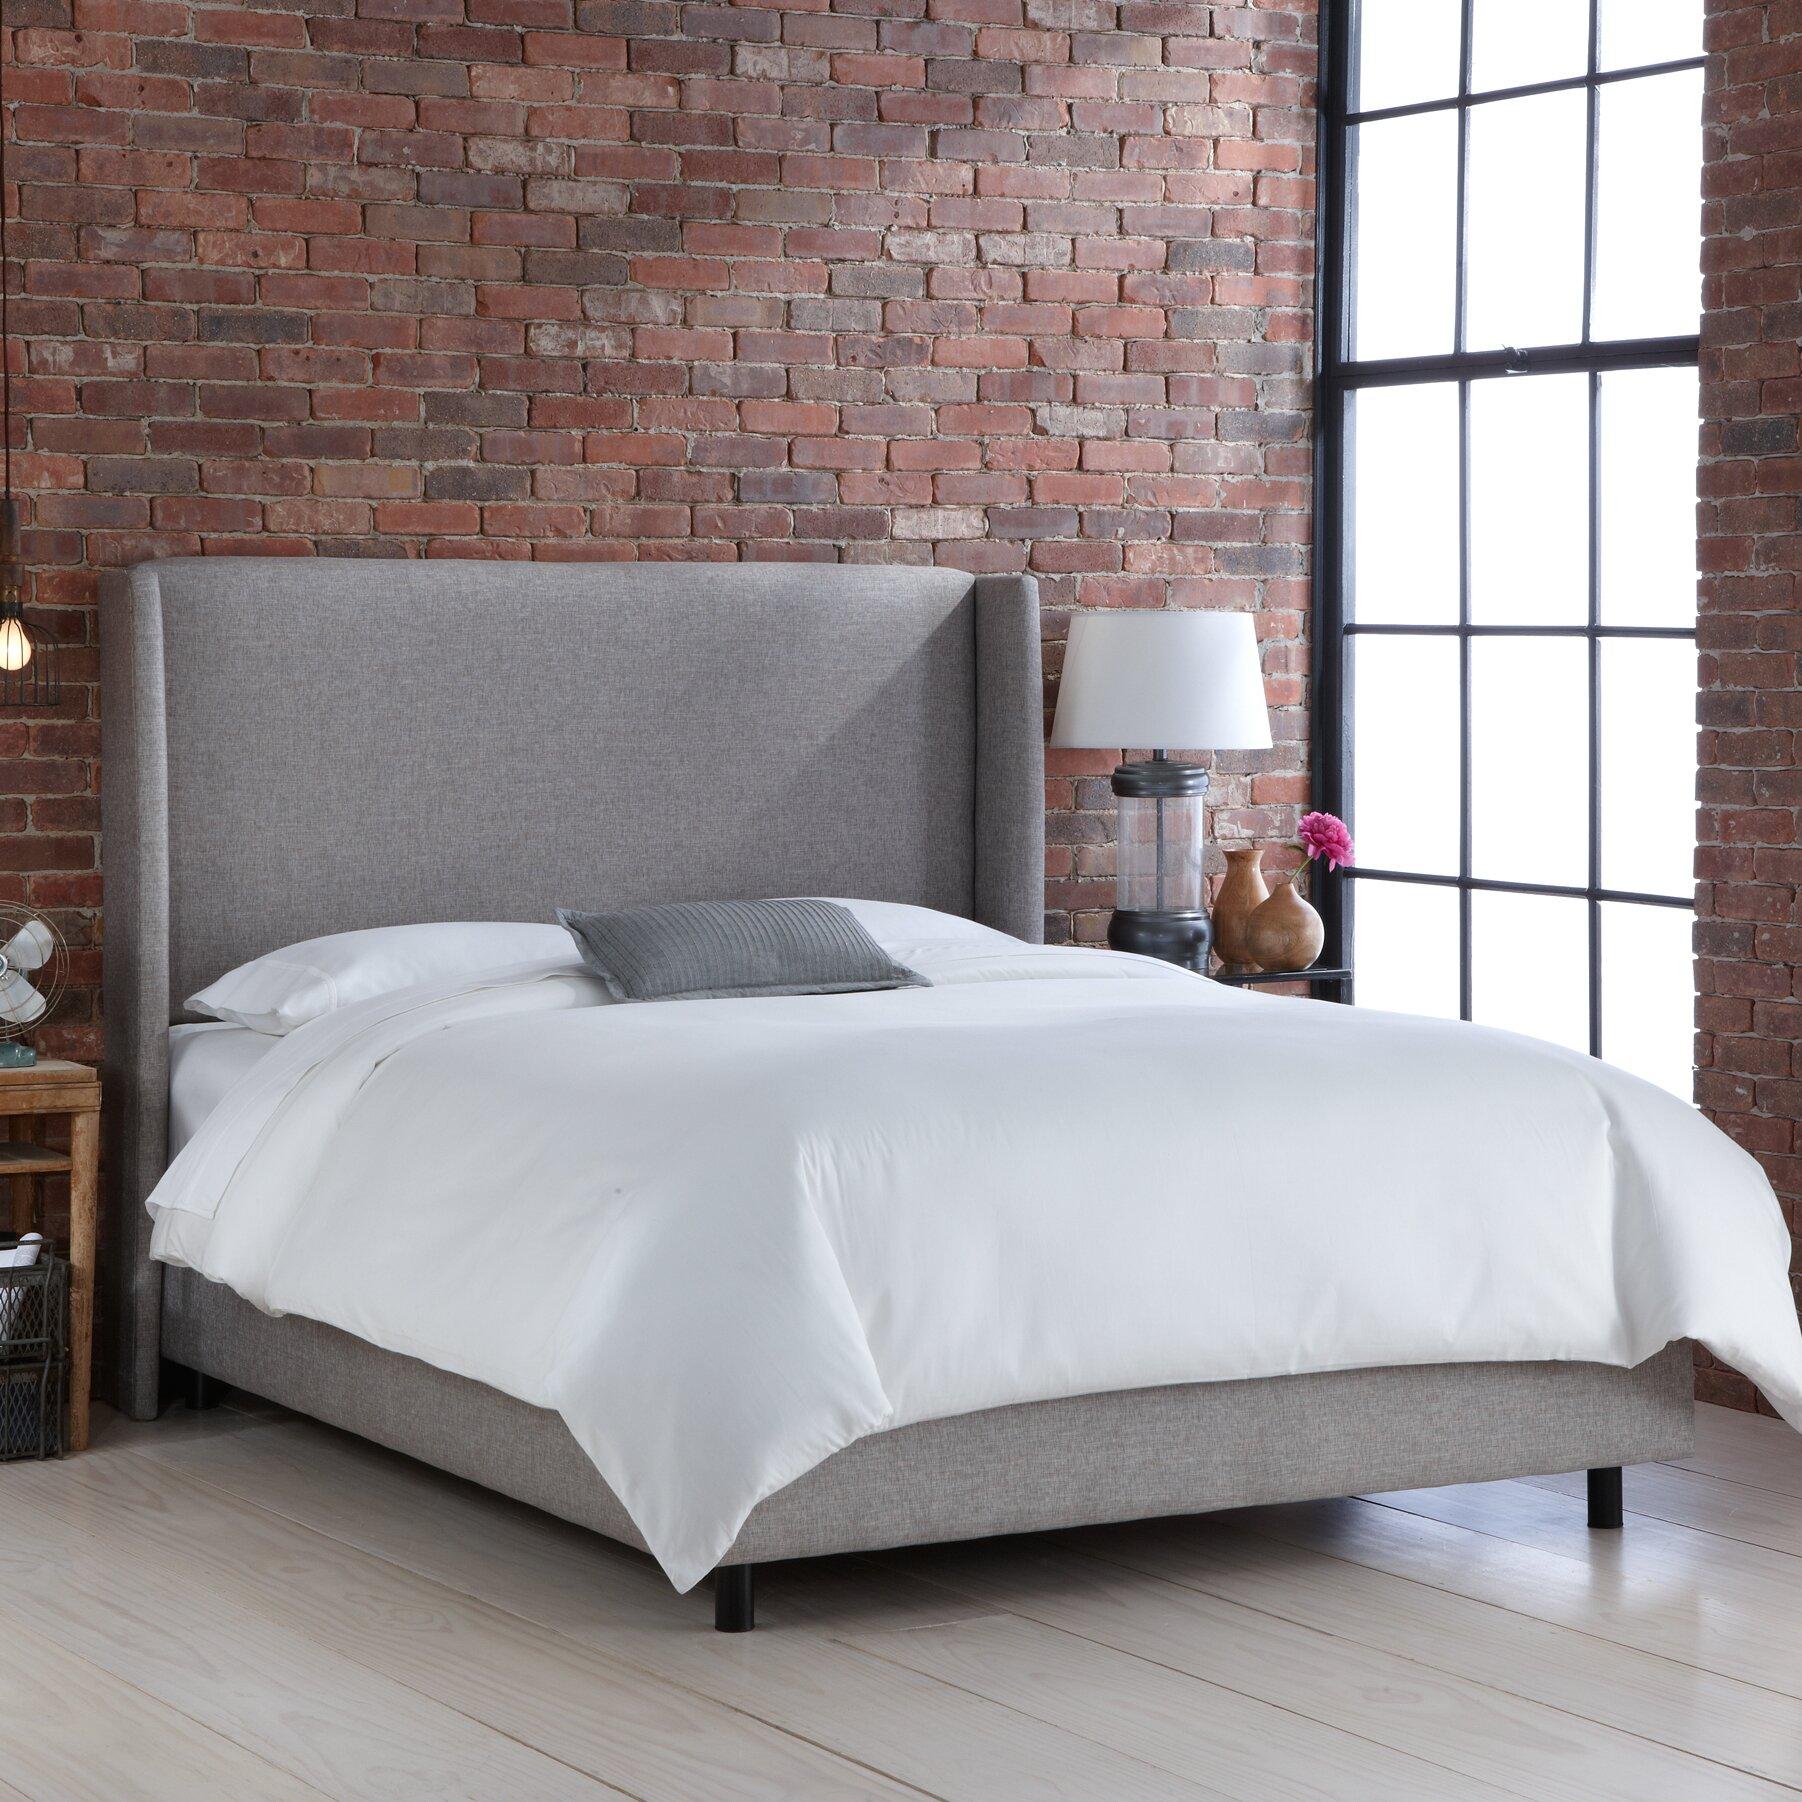 Skyline Bedroom Furniture Skyline Furniture Wingback Upholstered Panel Bed Reviews Wayfair